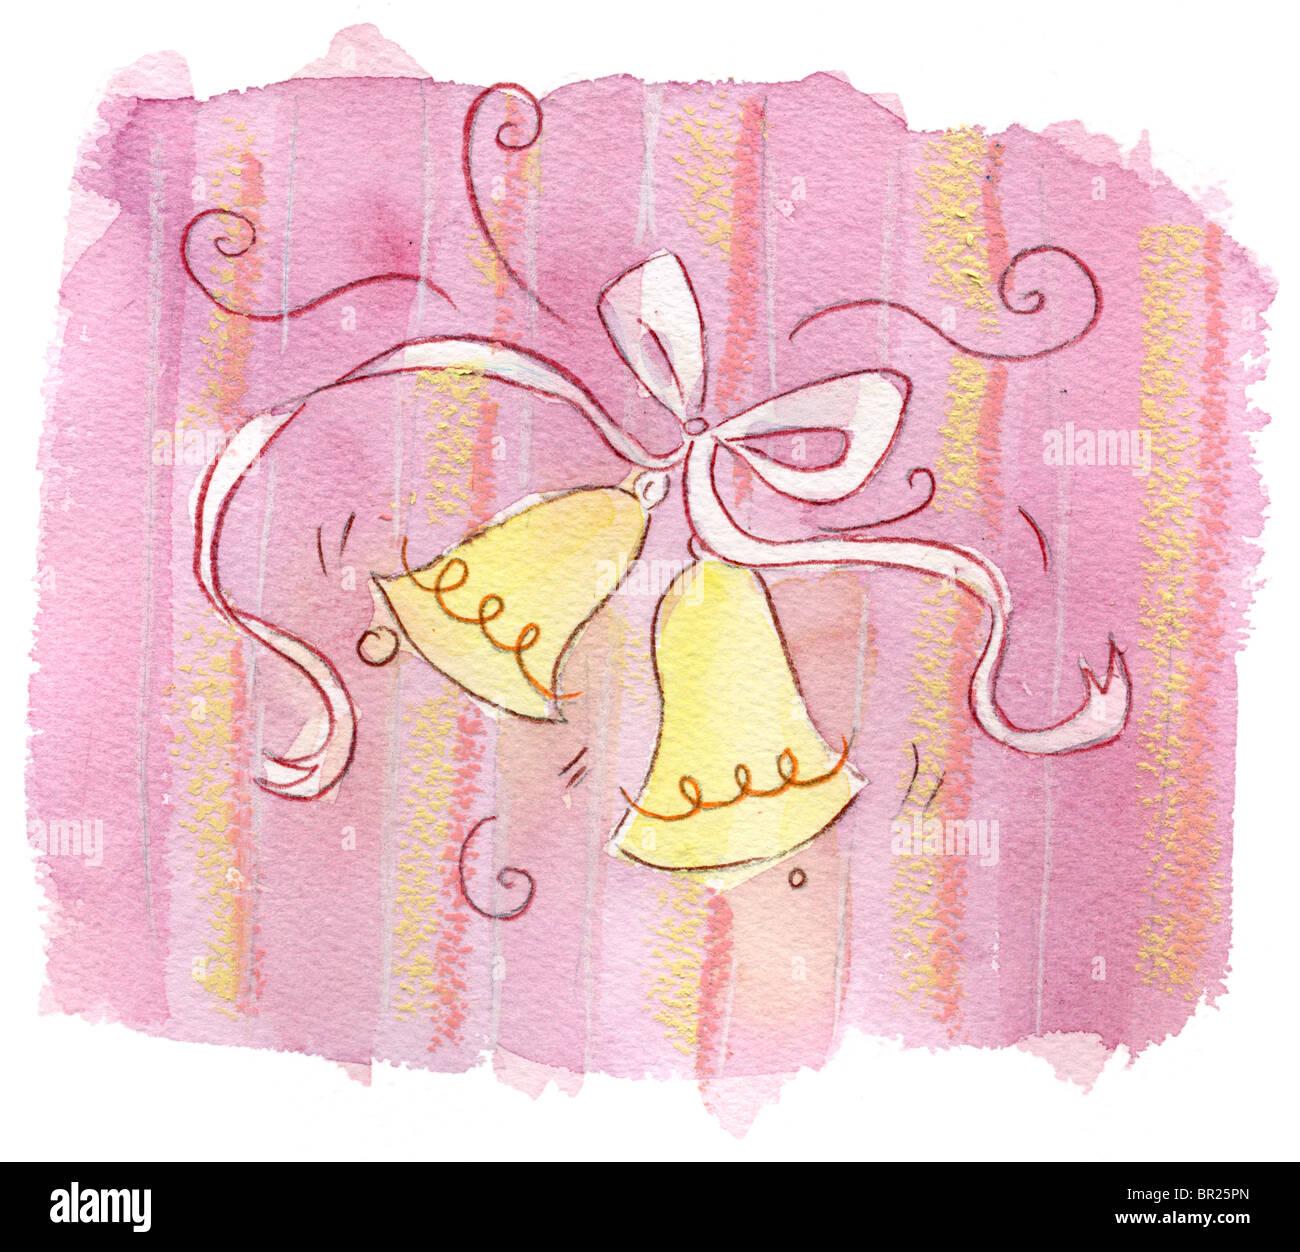 Wedding Bells Stock Photos & Wedding Bells Stock Images - Alamy